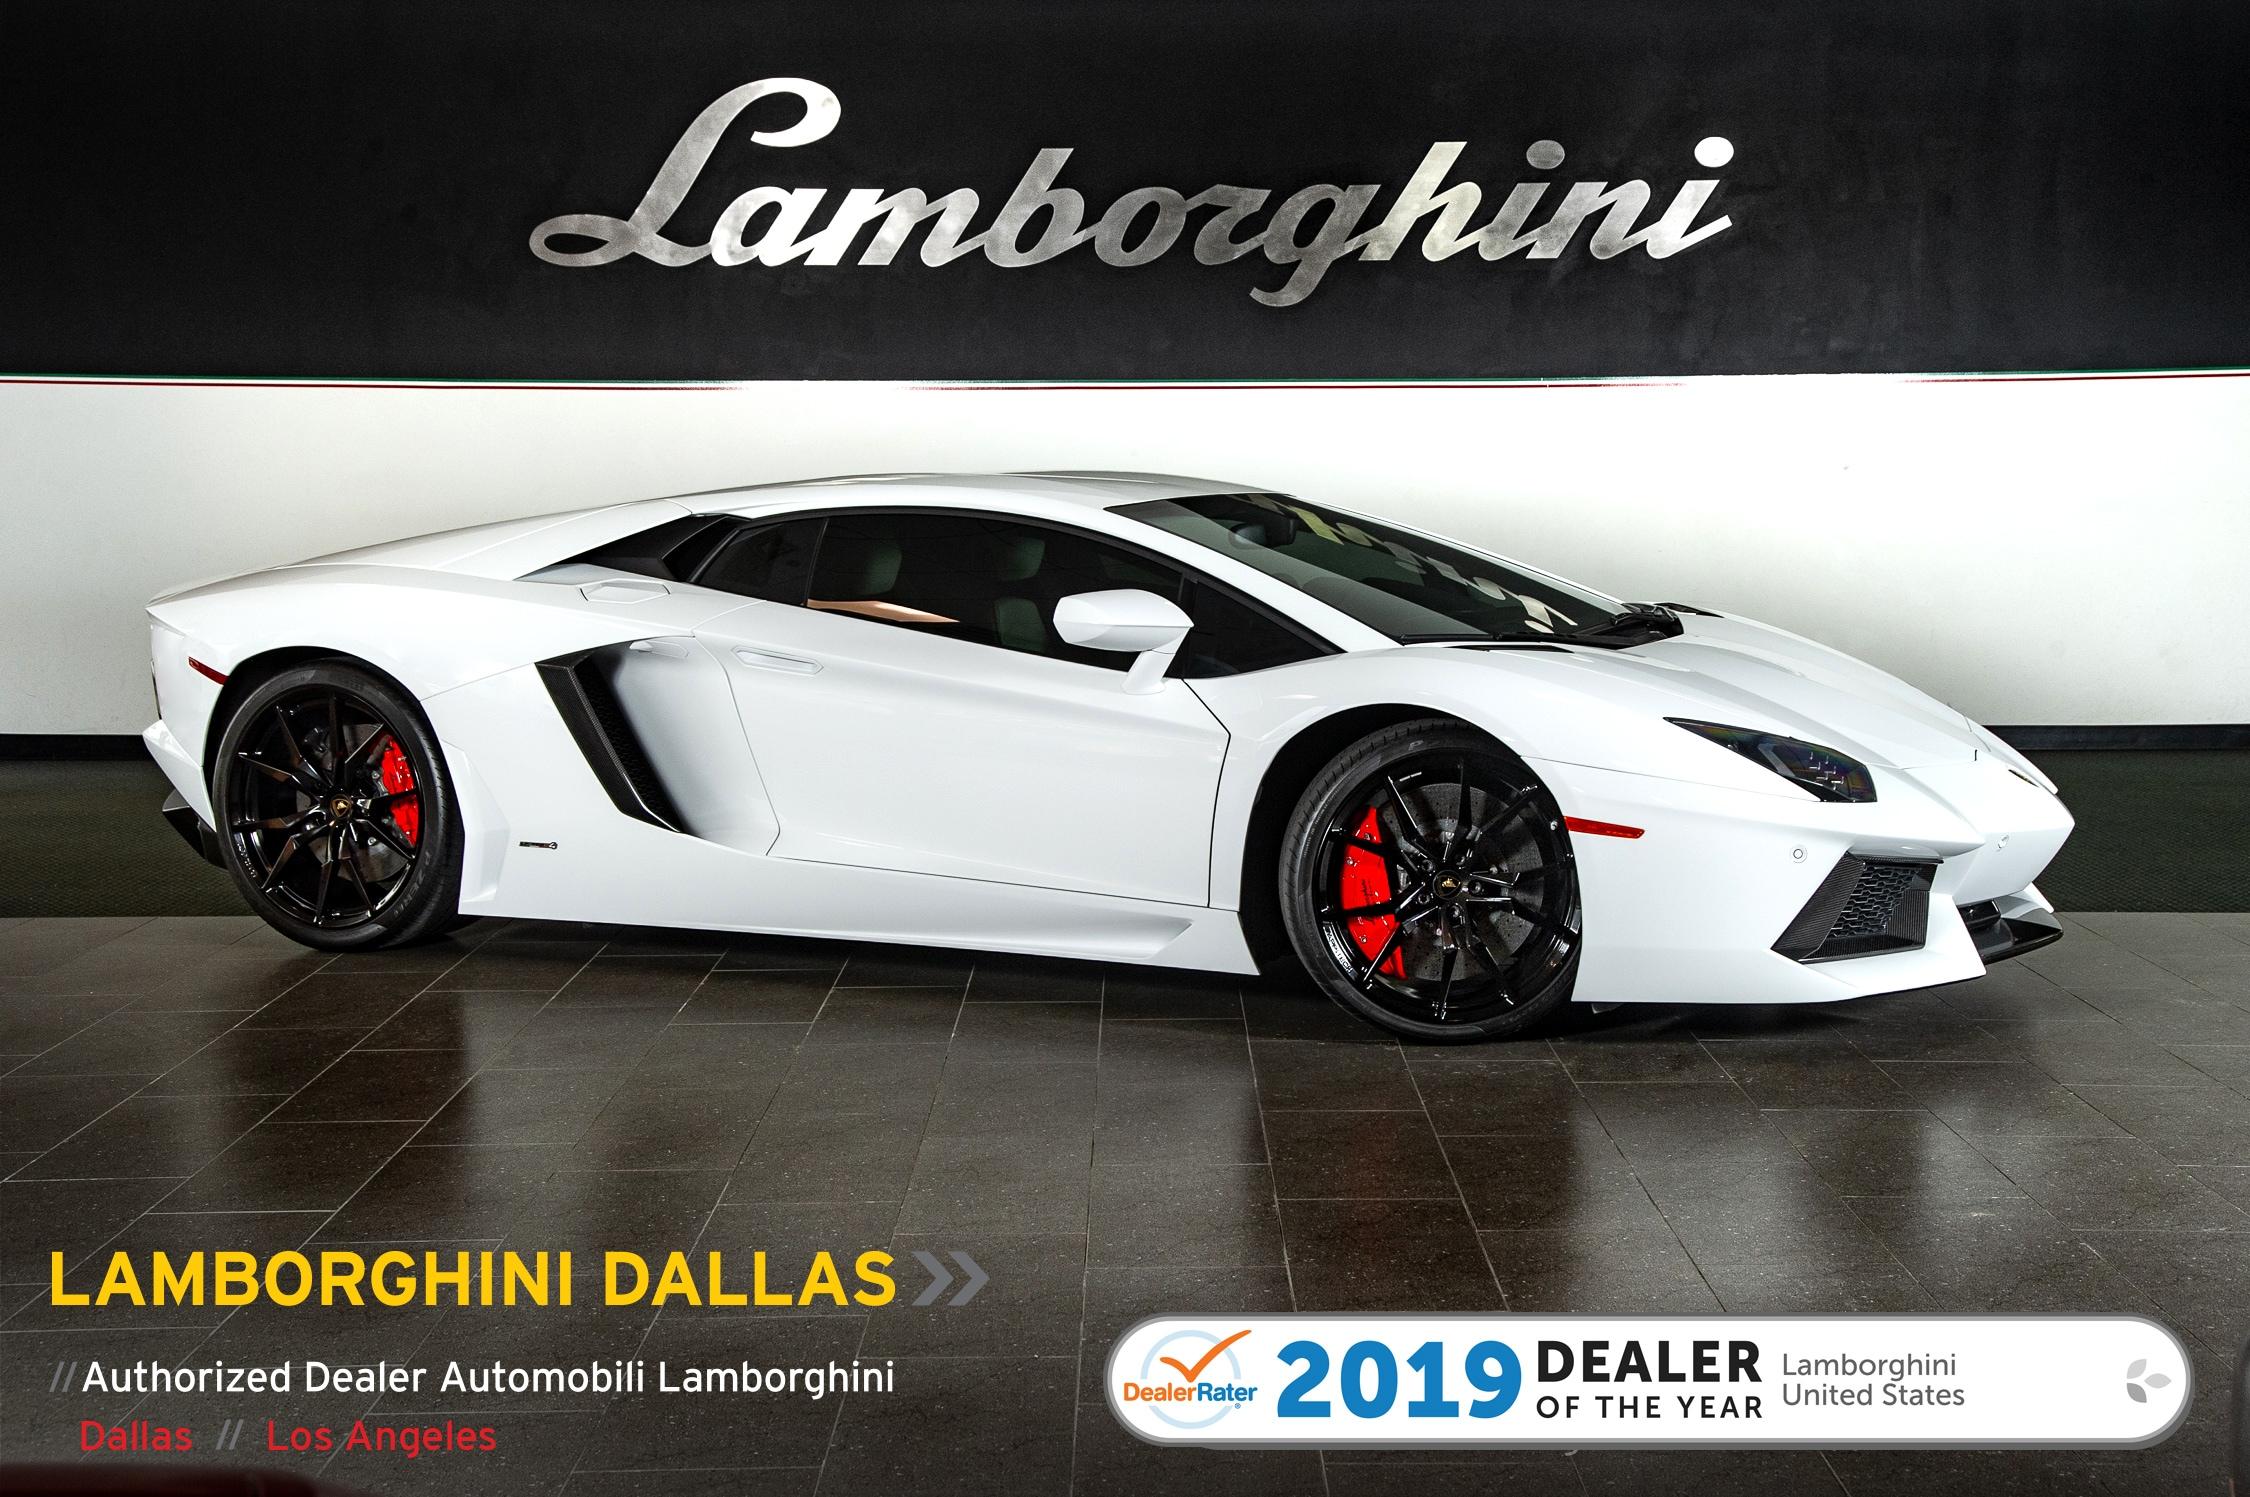 used 2014 Lamborghini Aventador LP700-4 car, priced at $299,999